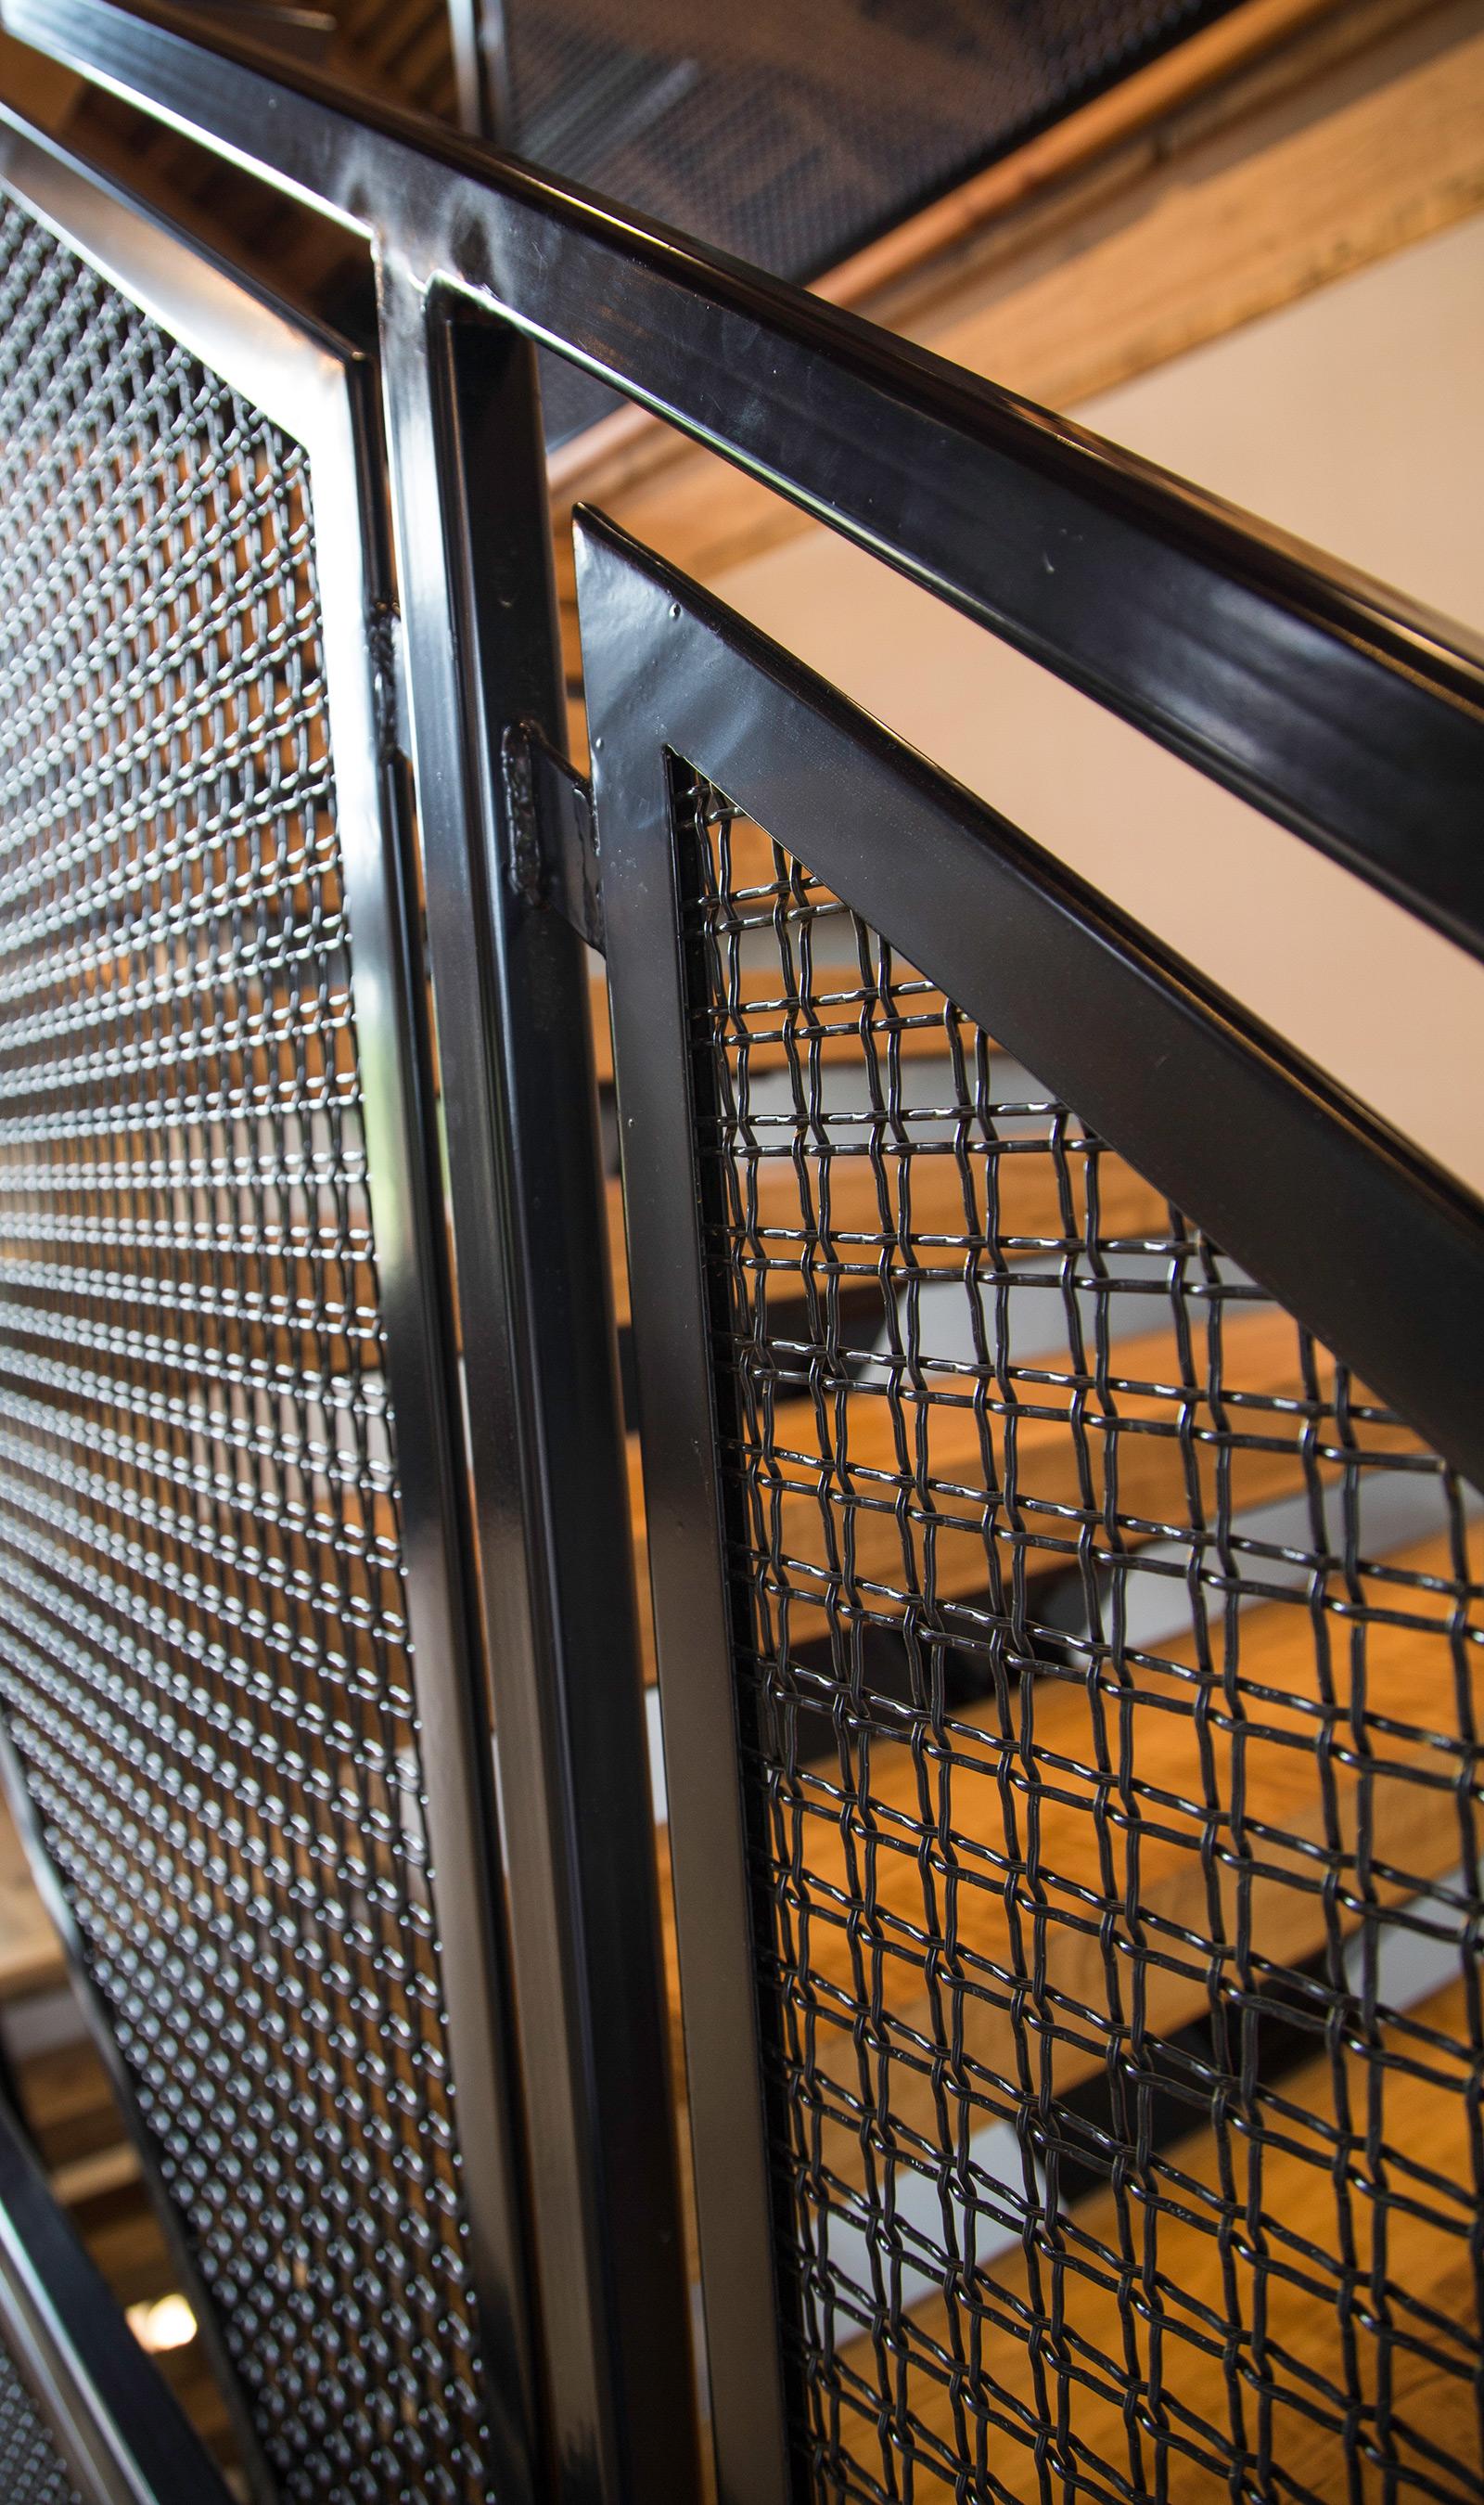 Banker Wire U-edge frames